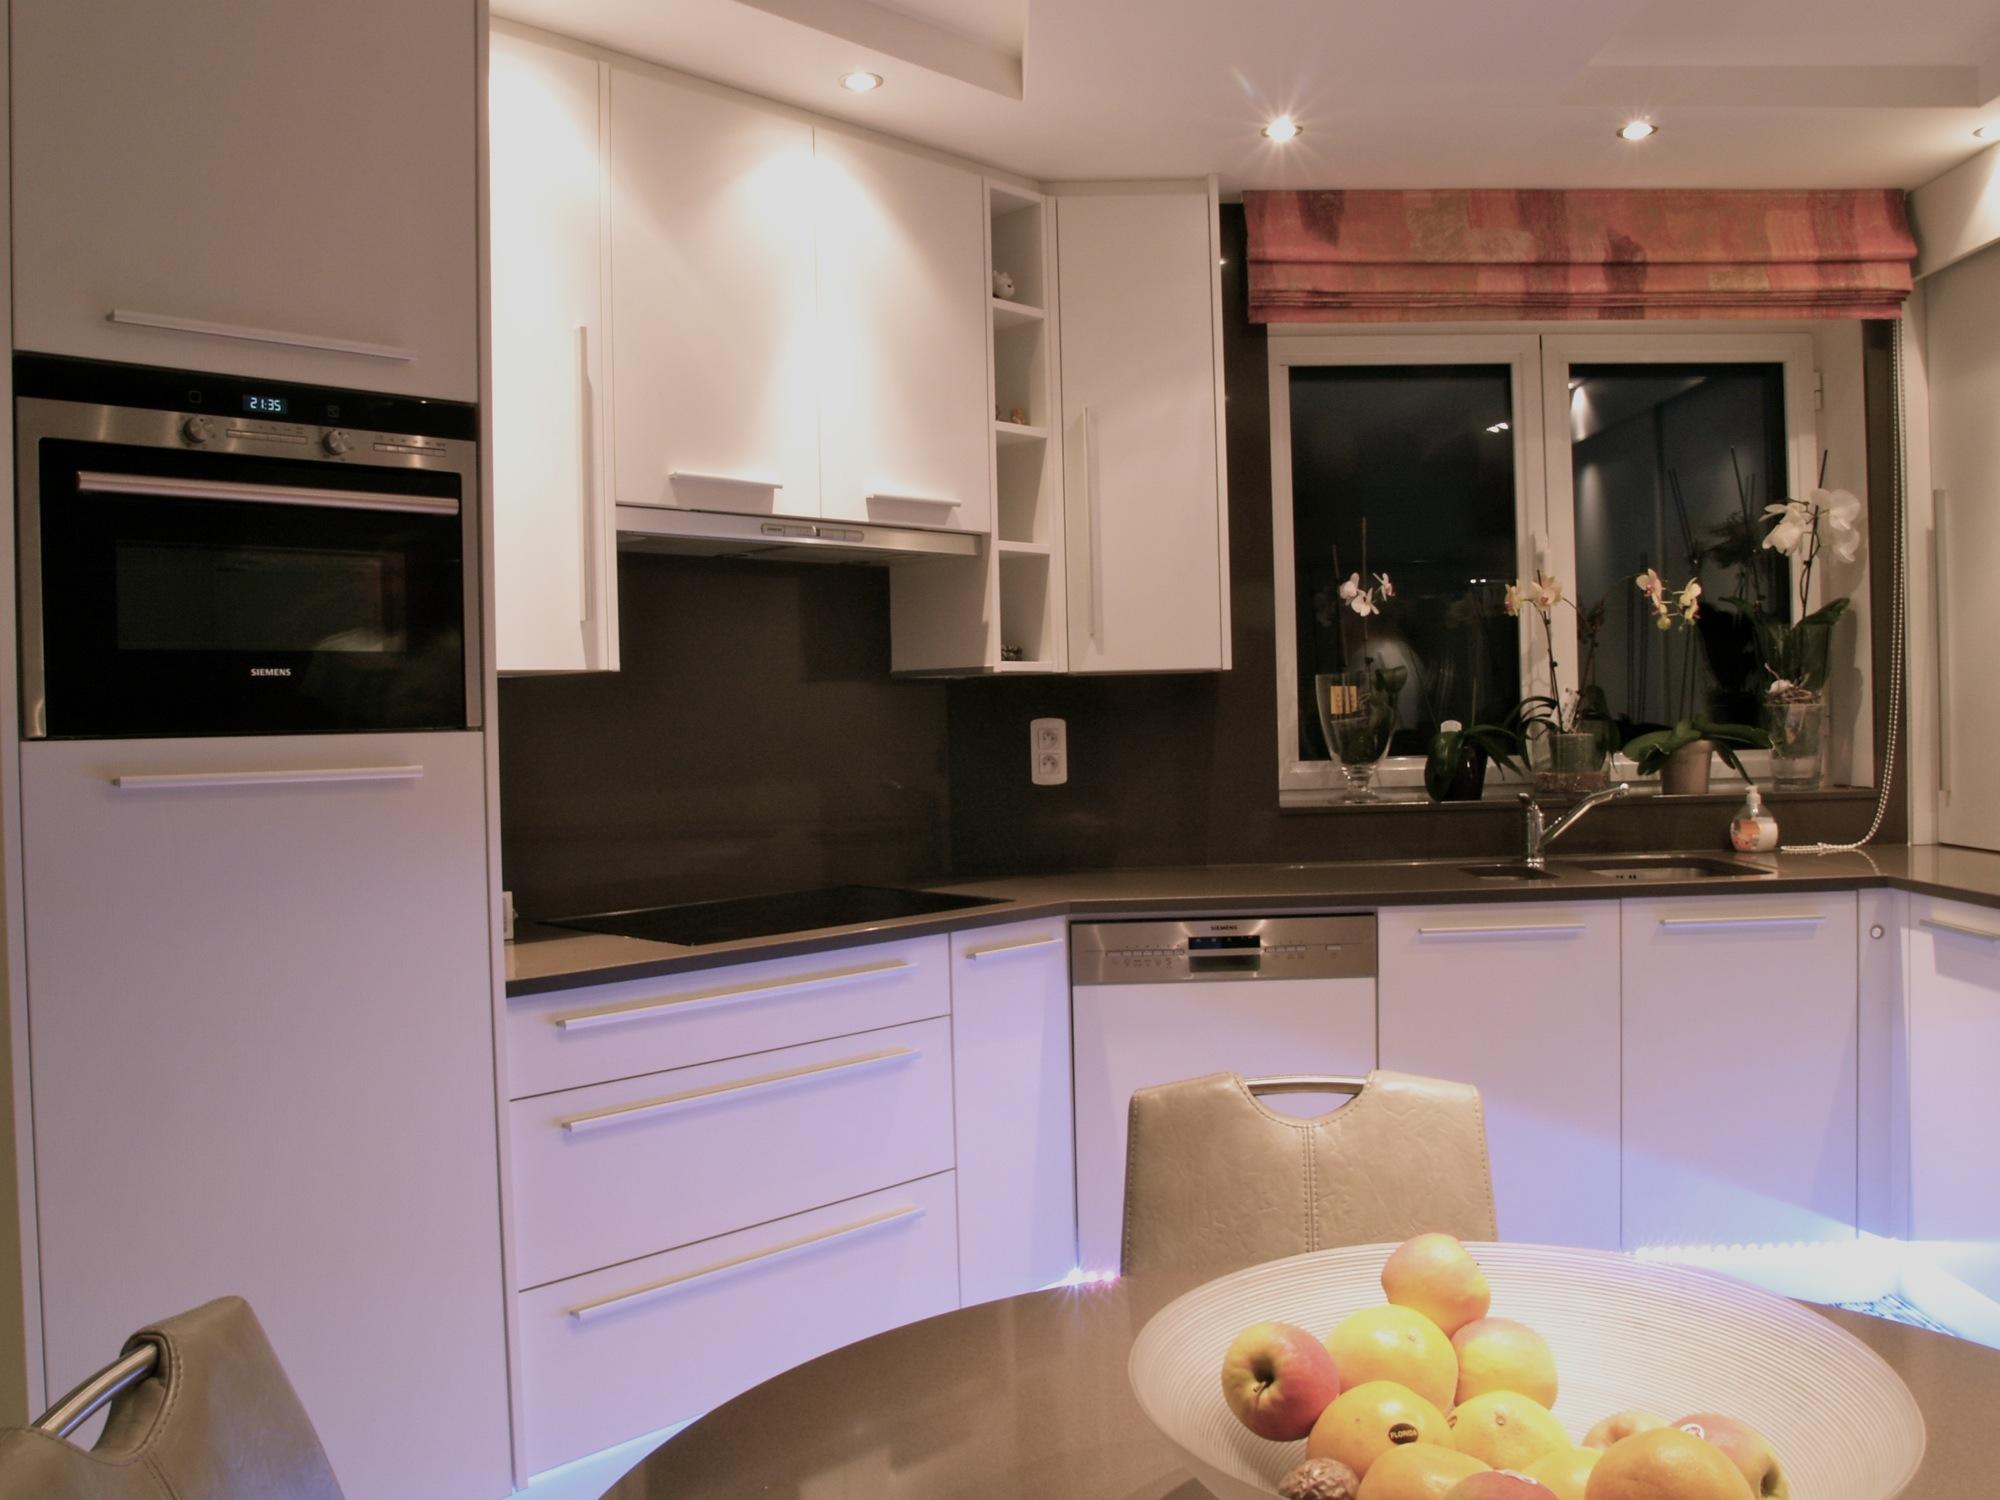 Keuken detemo interieur for Interieur keukens